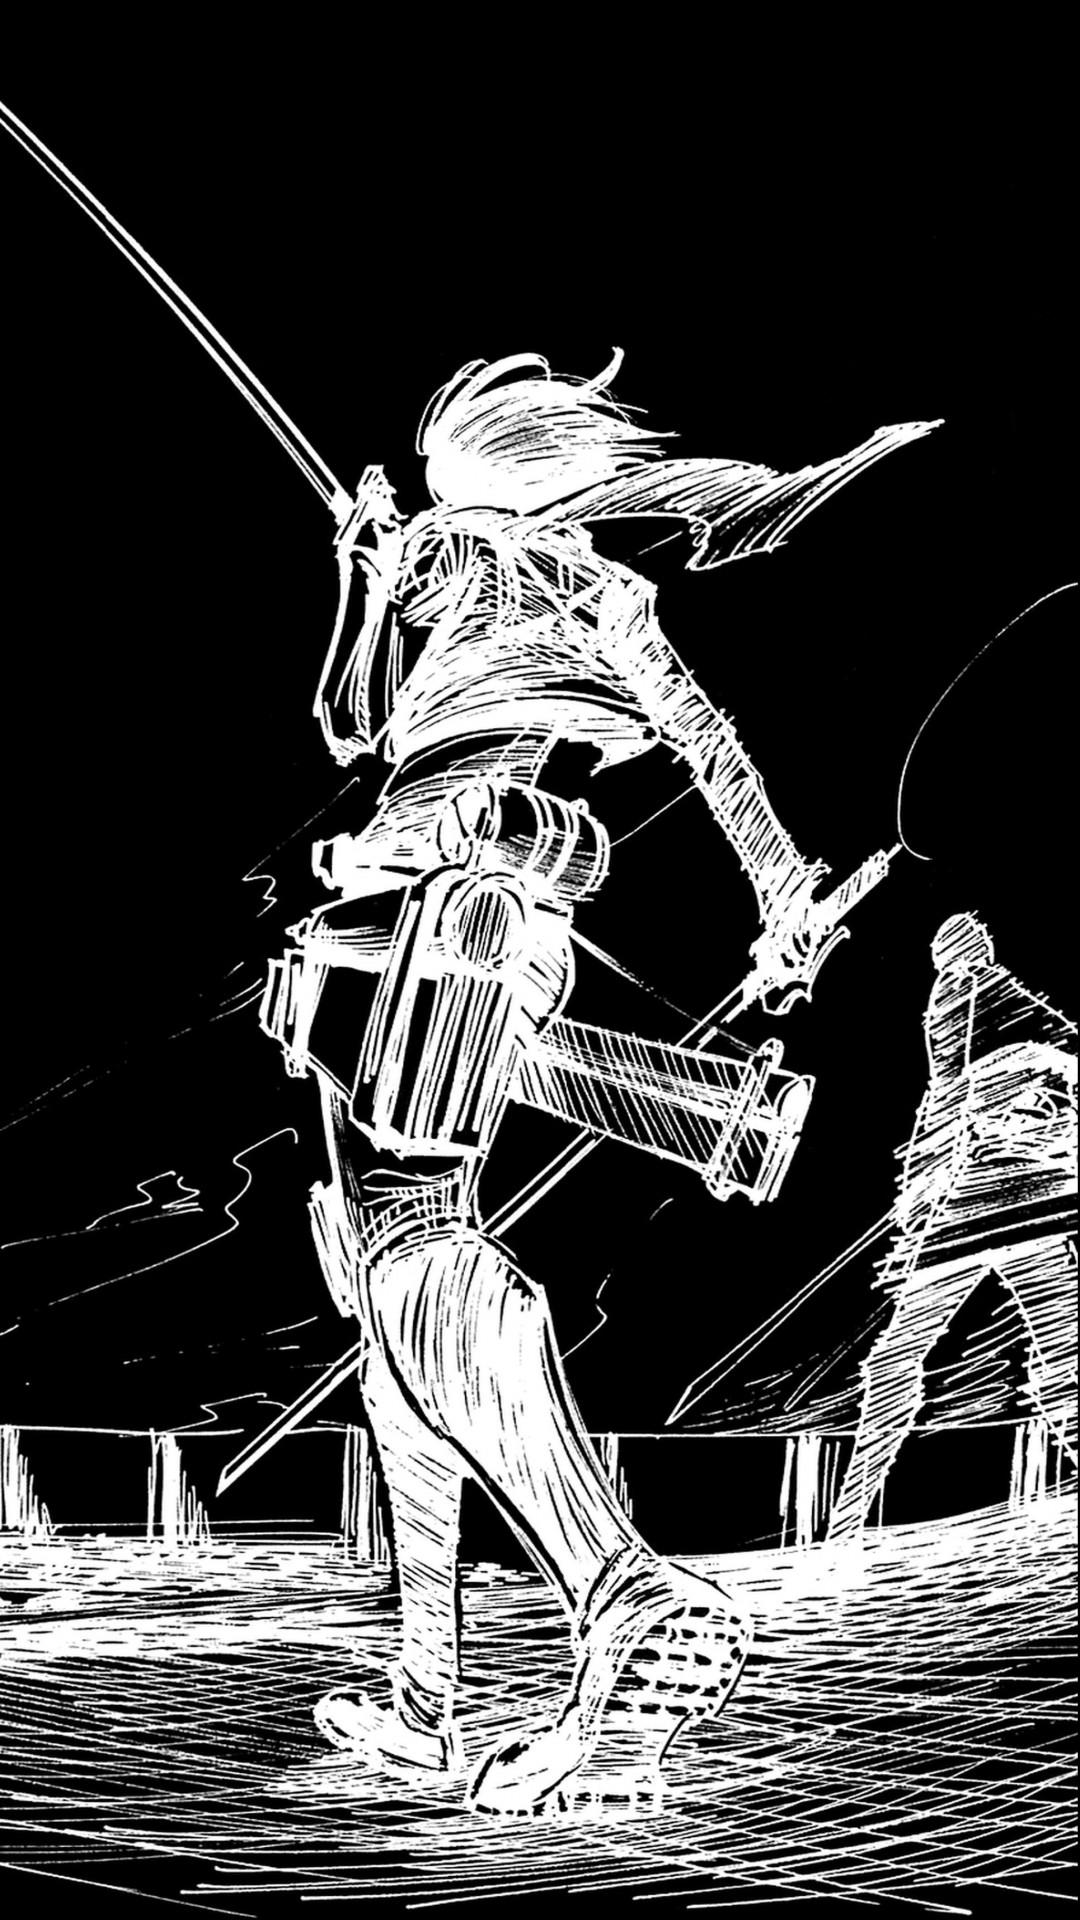 Anime Attack On Titan. Wallpaper 200004